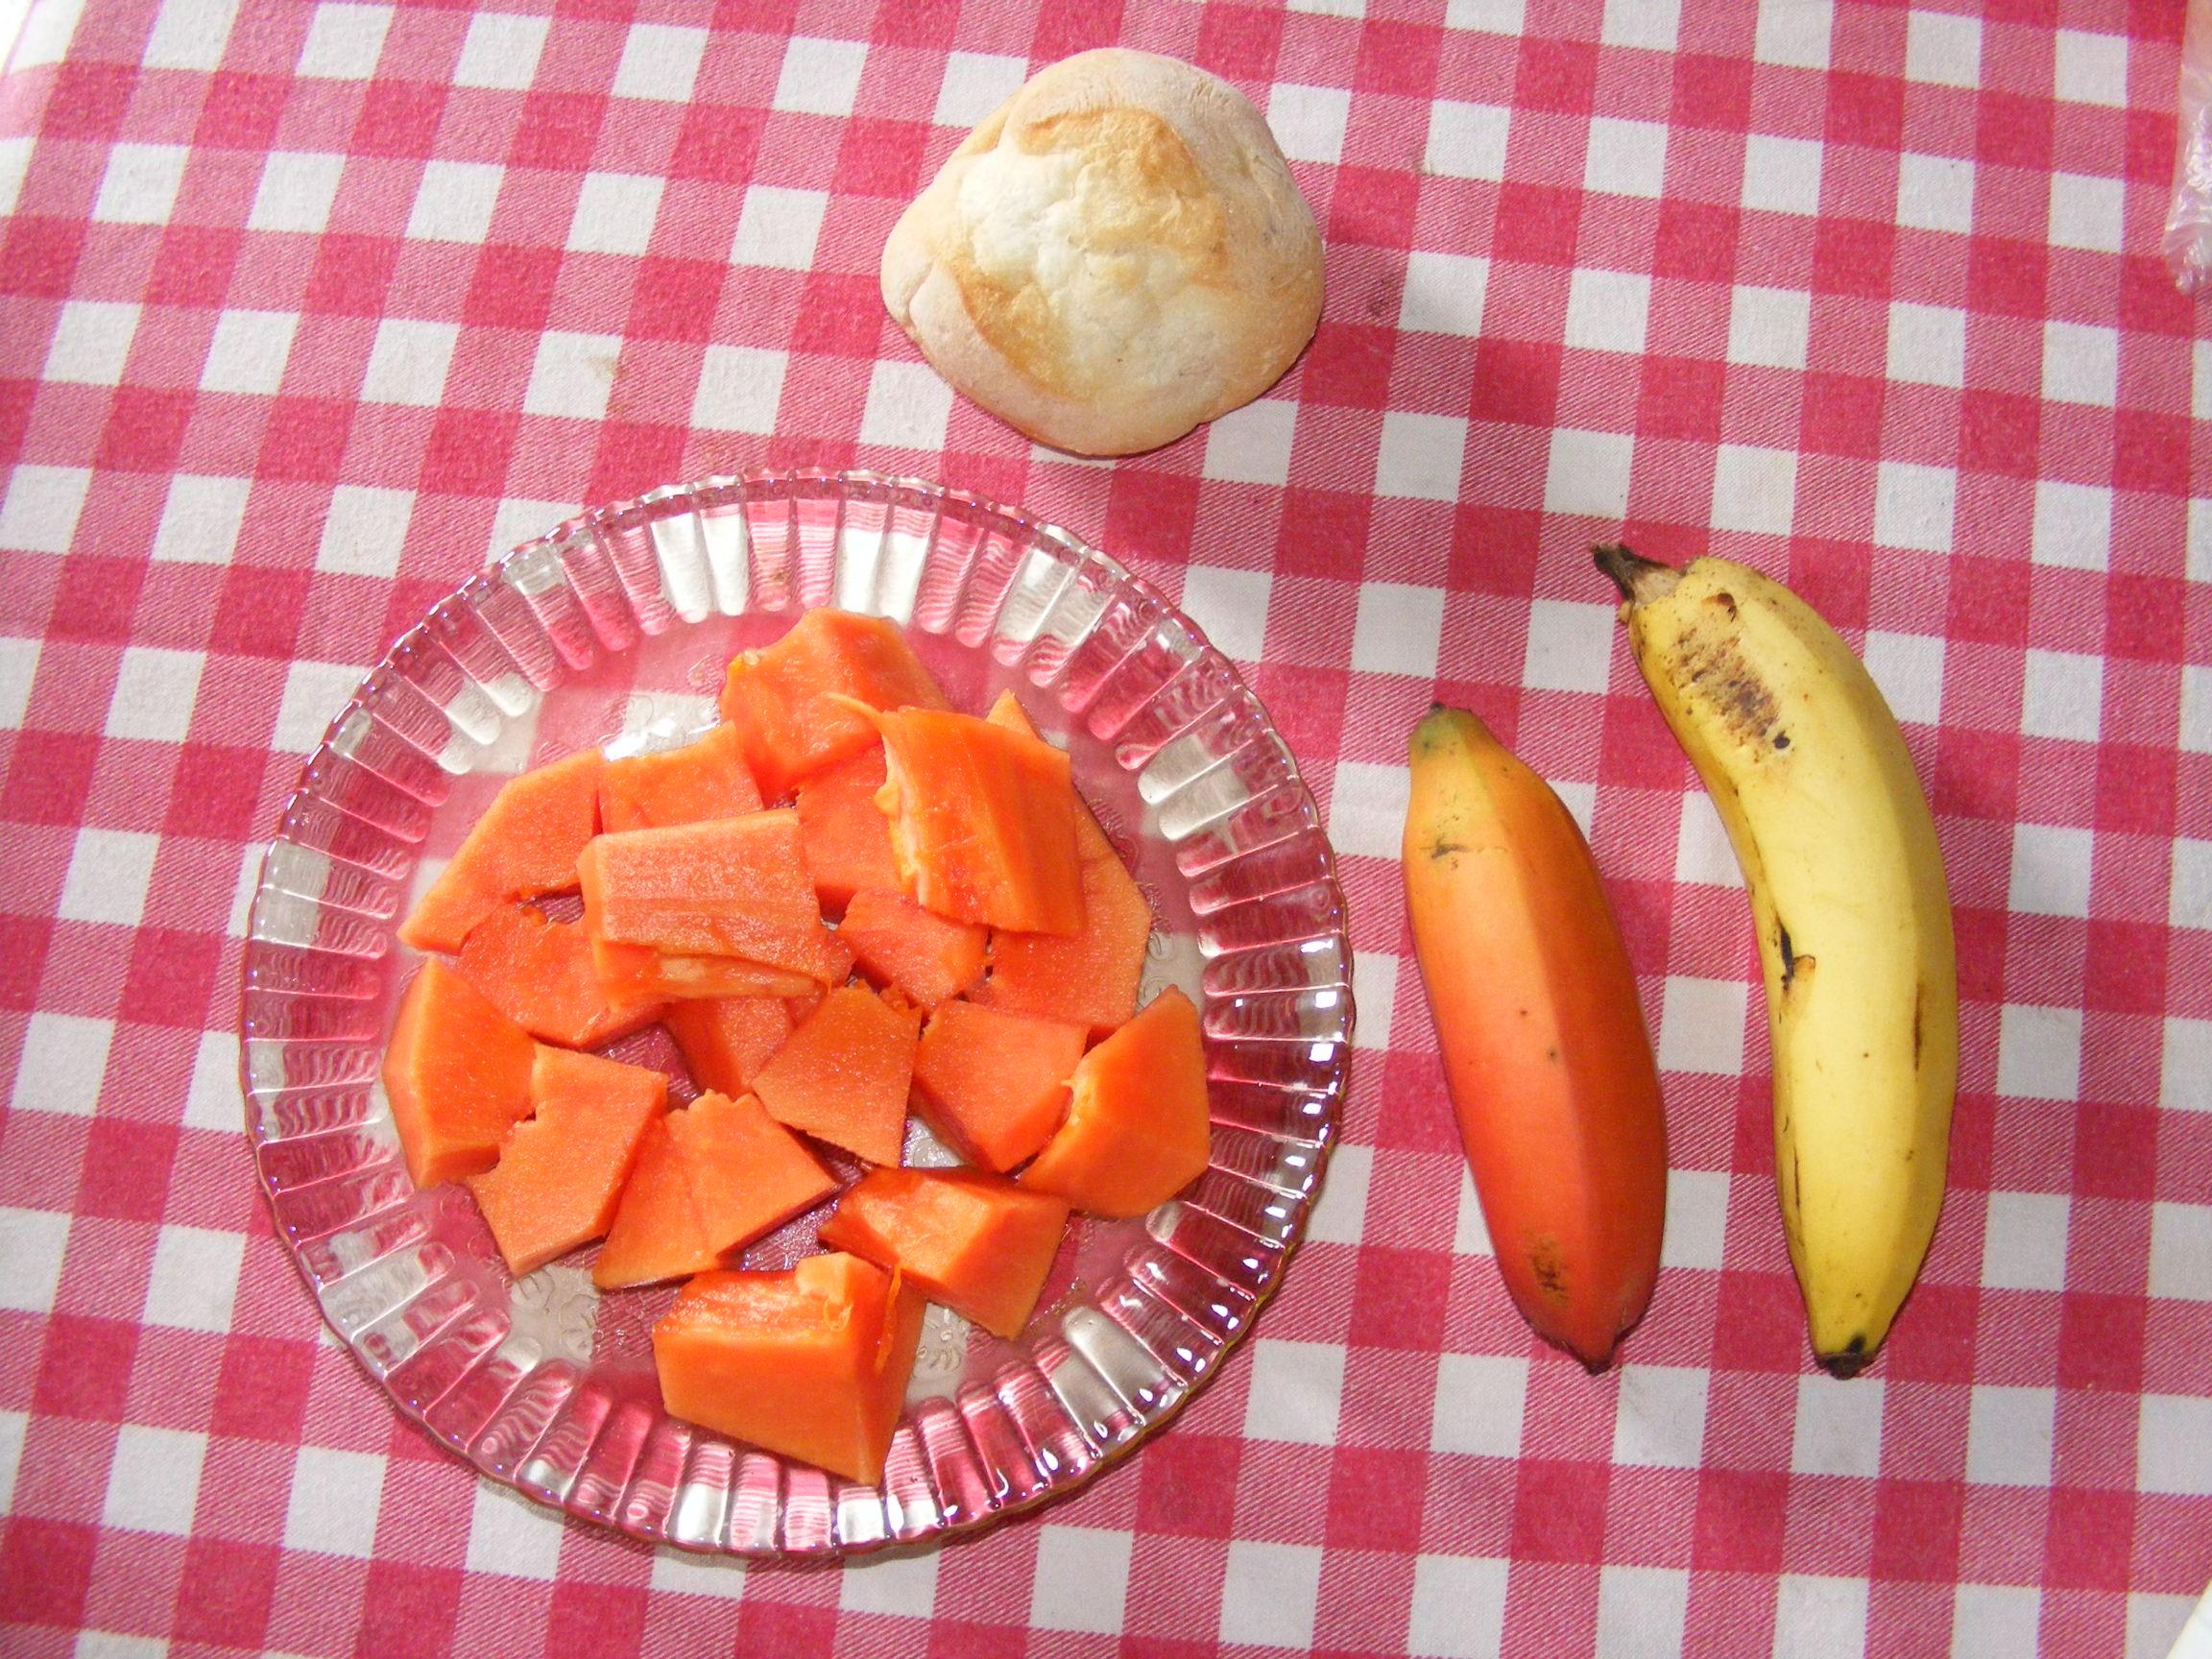 Petit déjeuner fruité: papaye et bananes !!